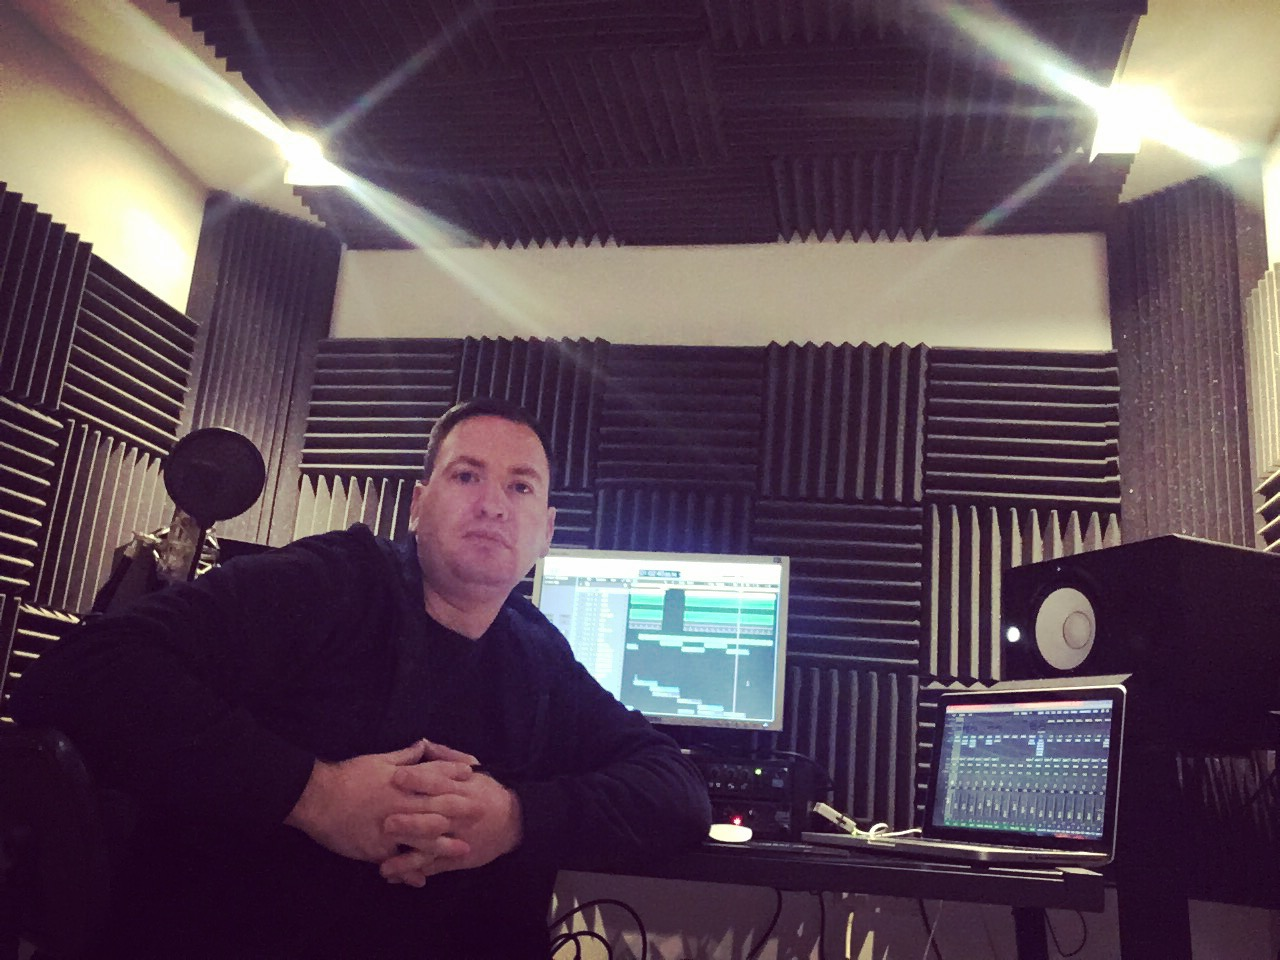 DJ Darrell in the studio producing music.